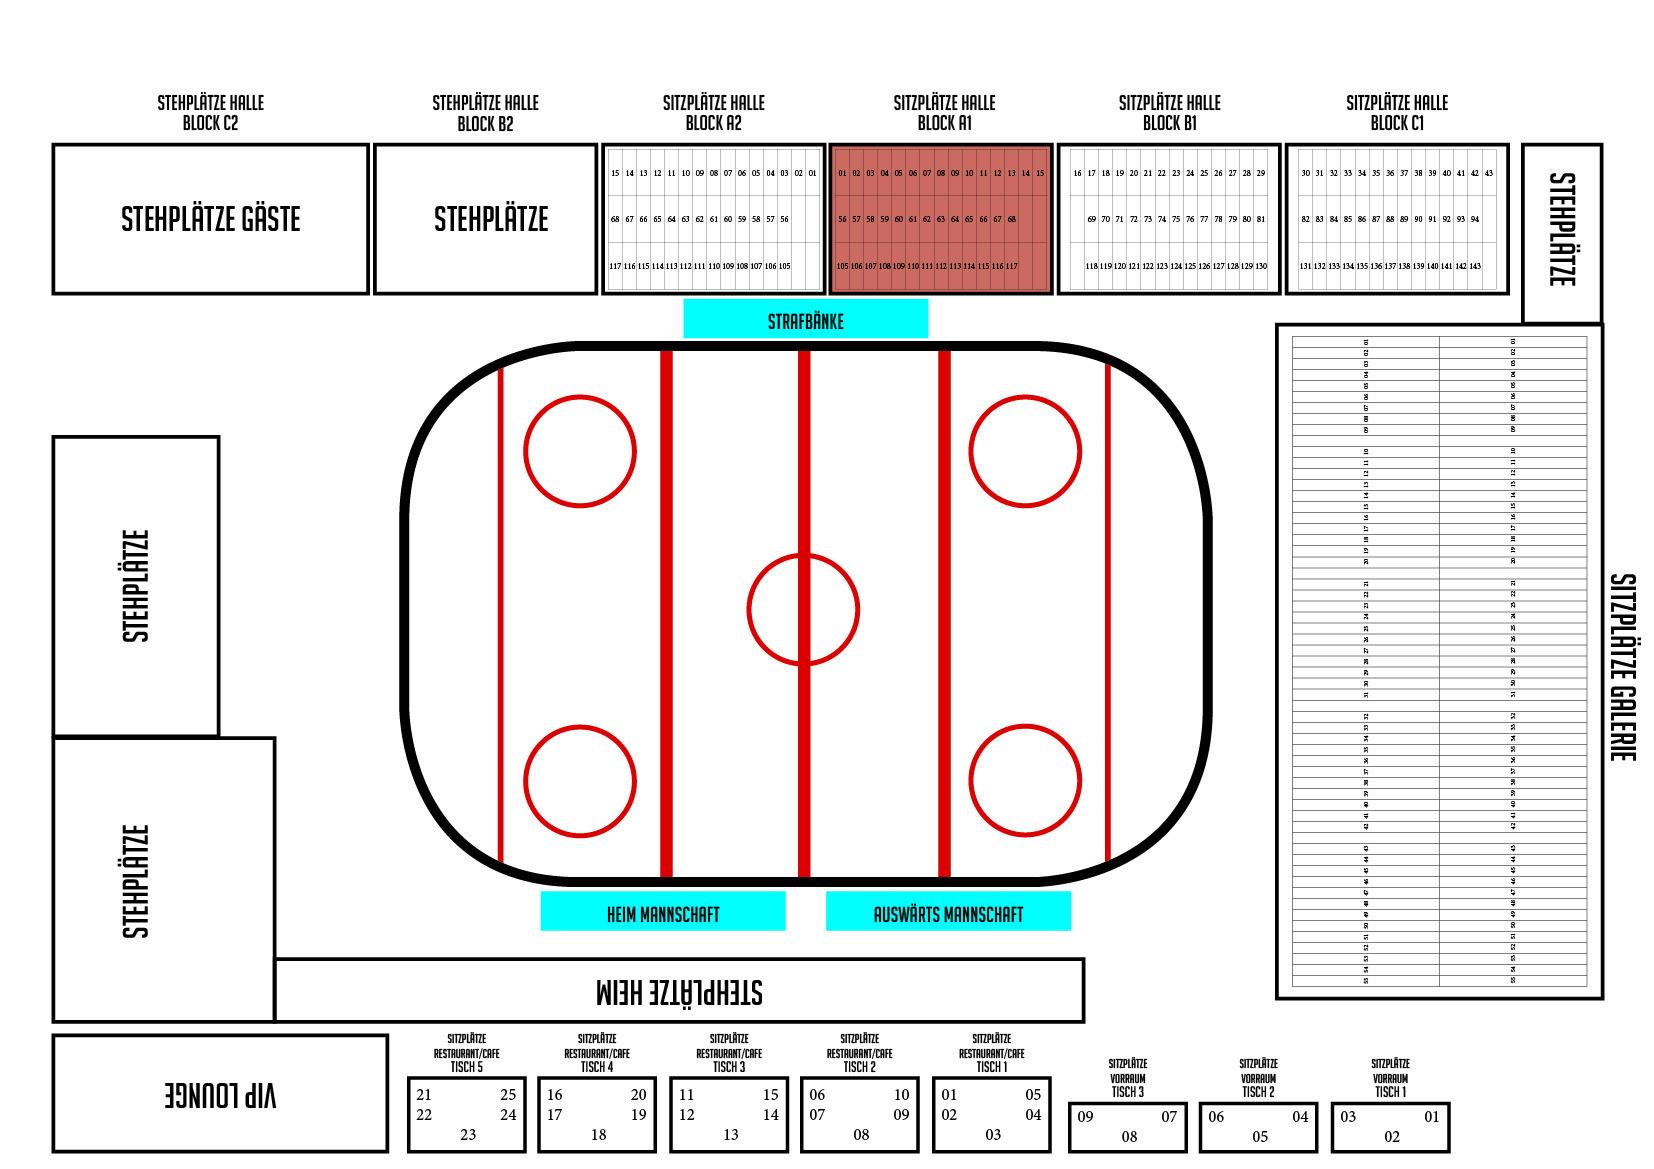 Dauerkarte 2017/18 Sitzplatz BLOCK A1 100331-A1